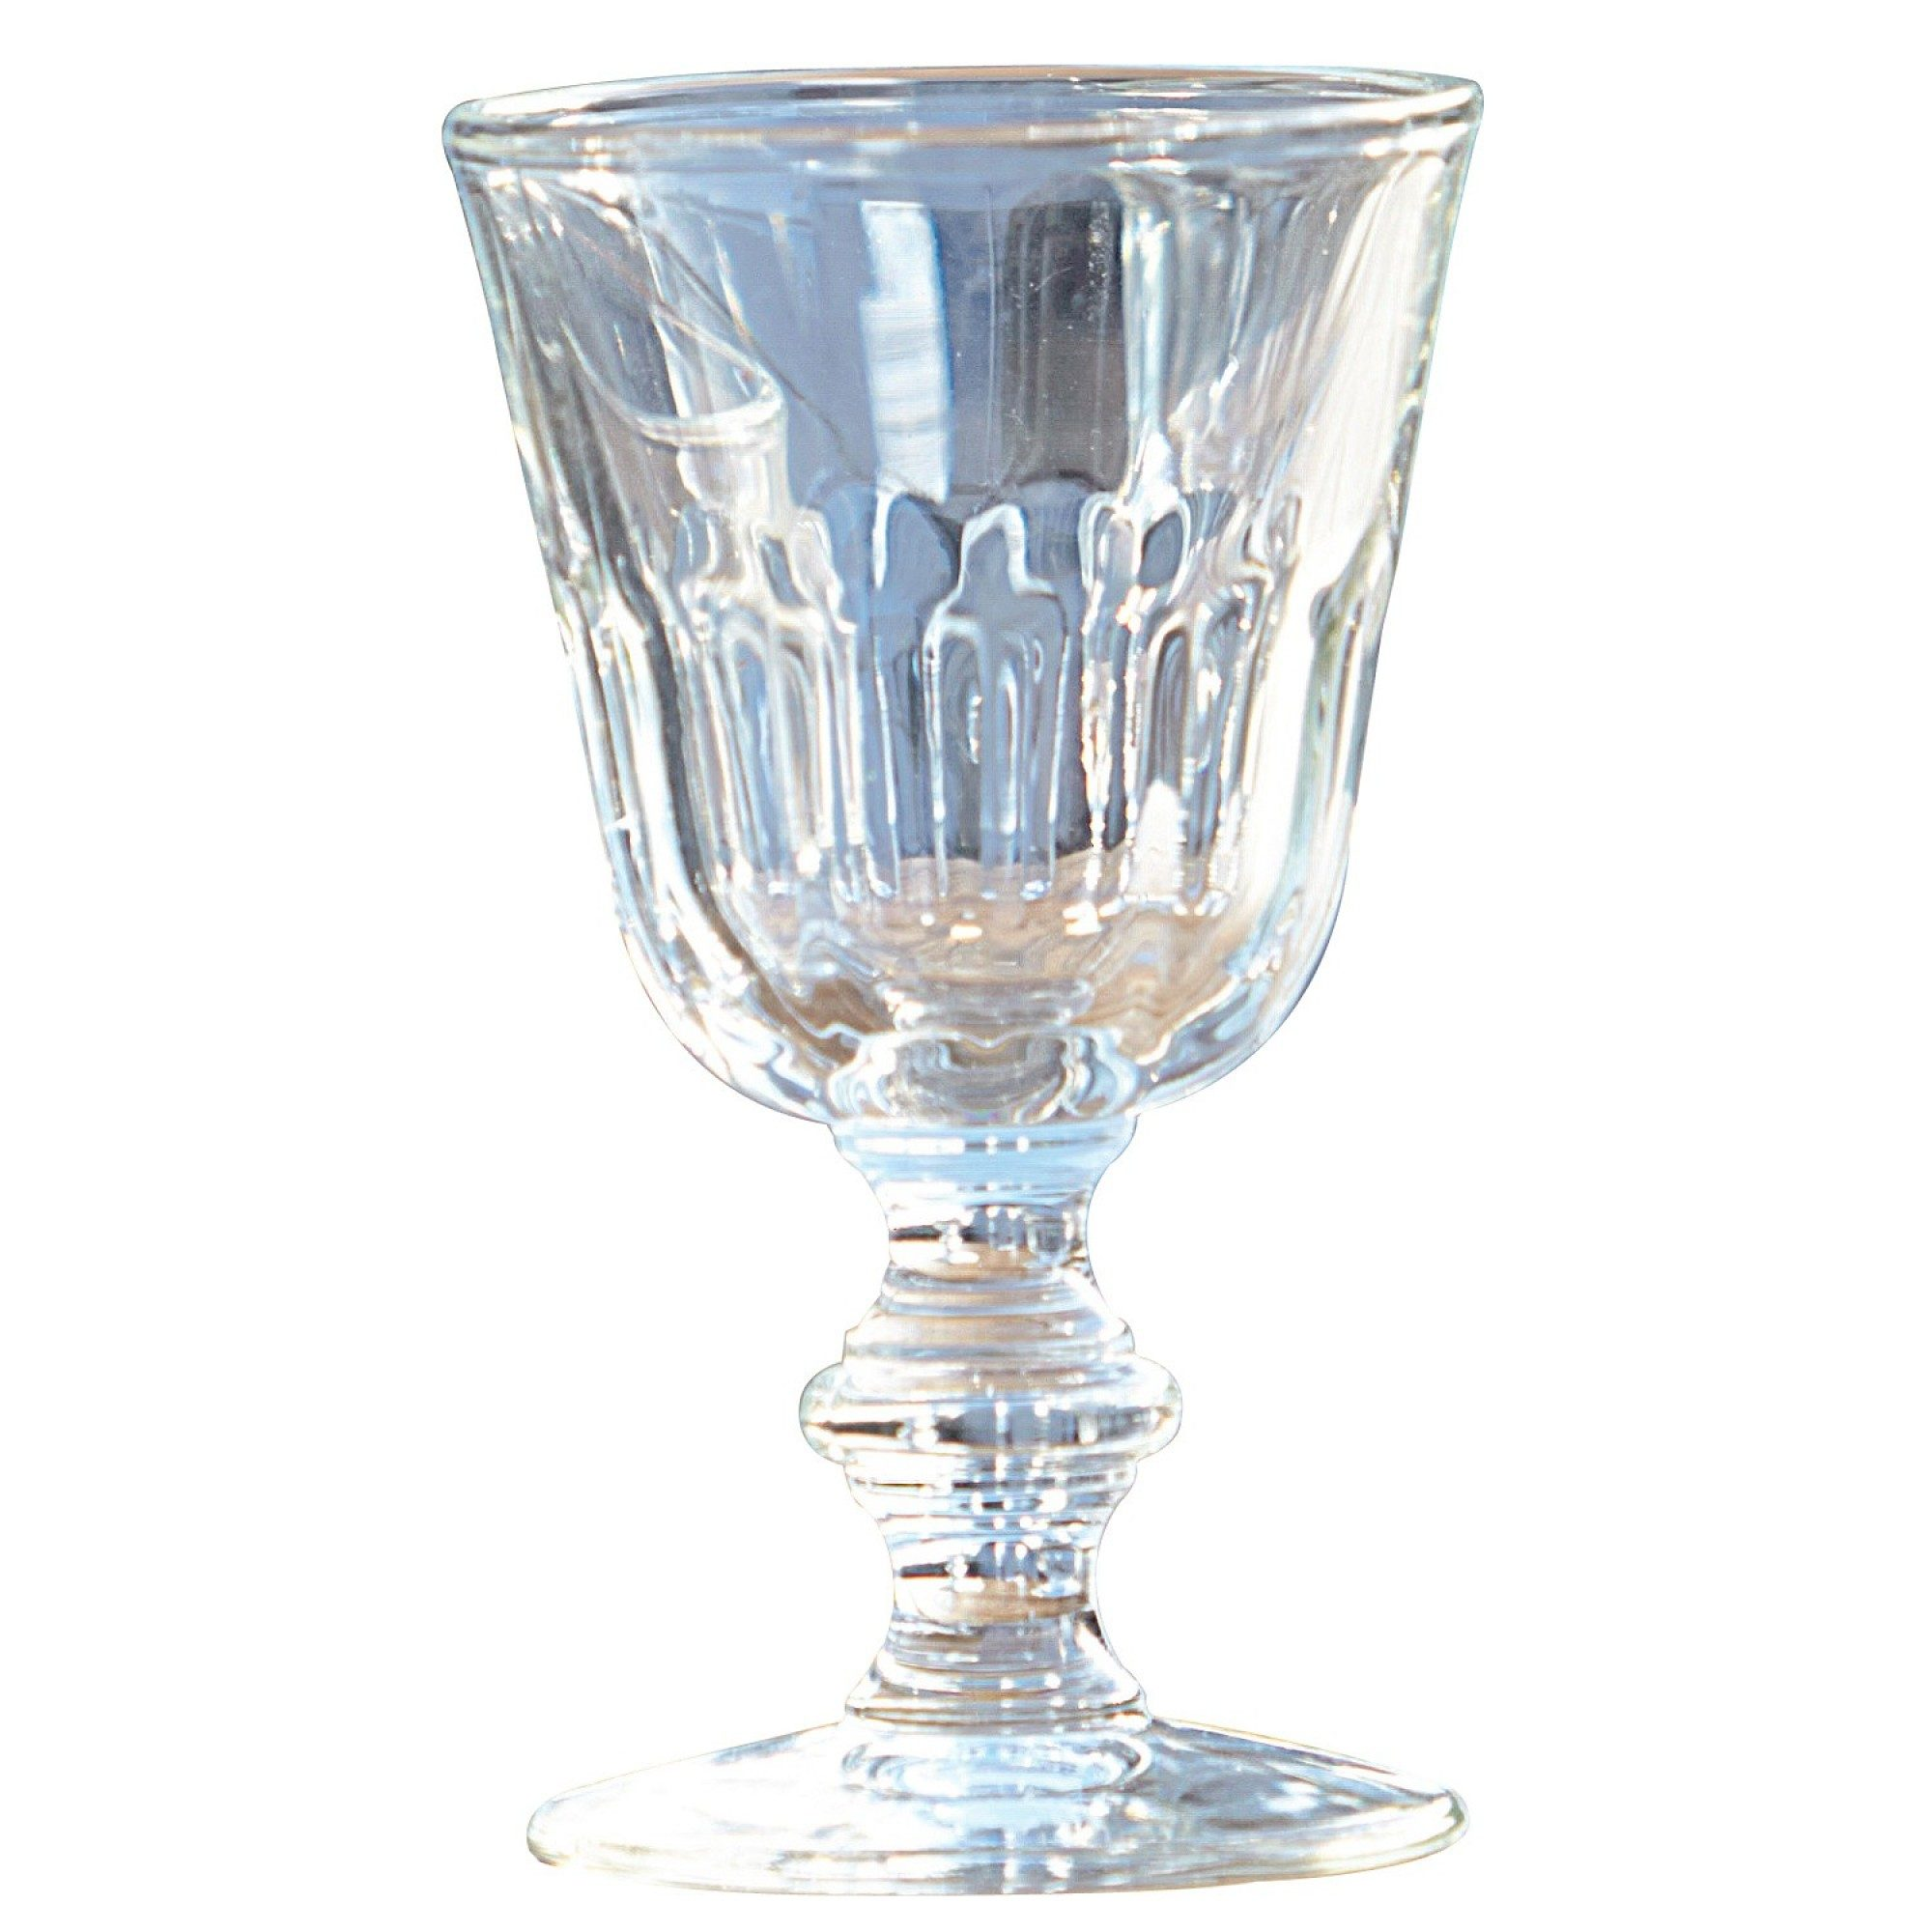 Loberon Weinglaser 6er Packung »Pouce vin«